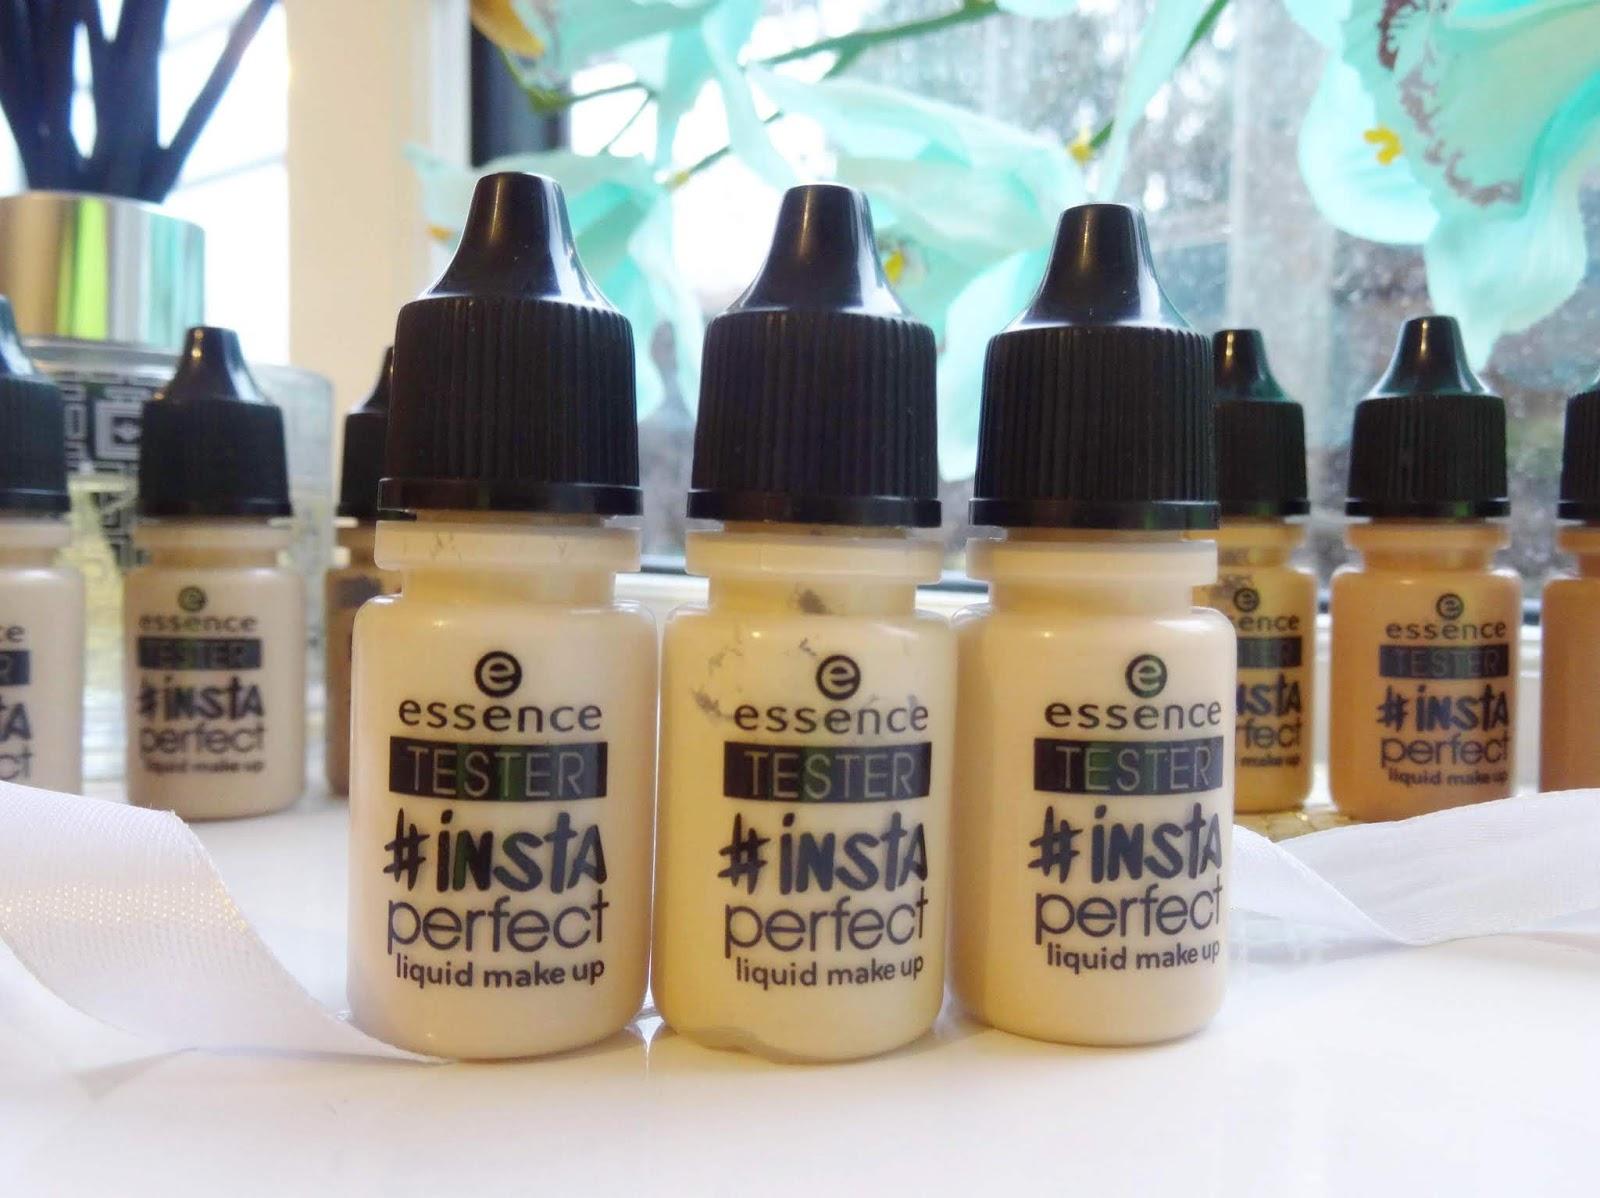 Essence #Insta Perfect Liquid Foundation Review